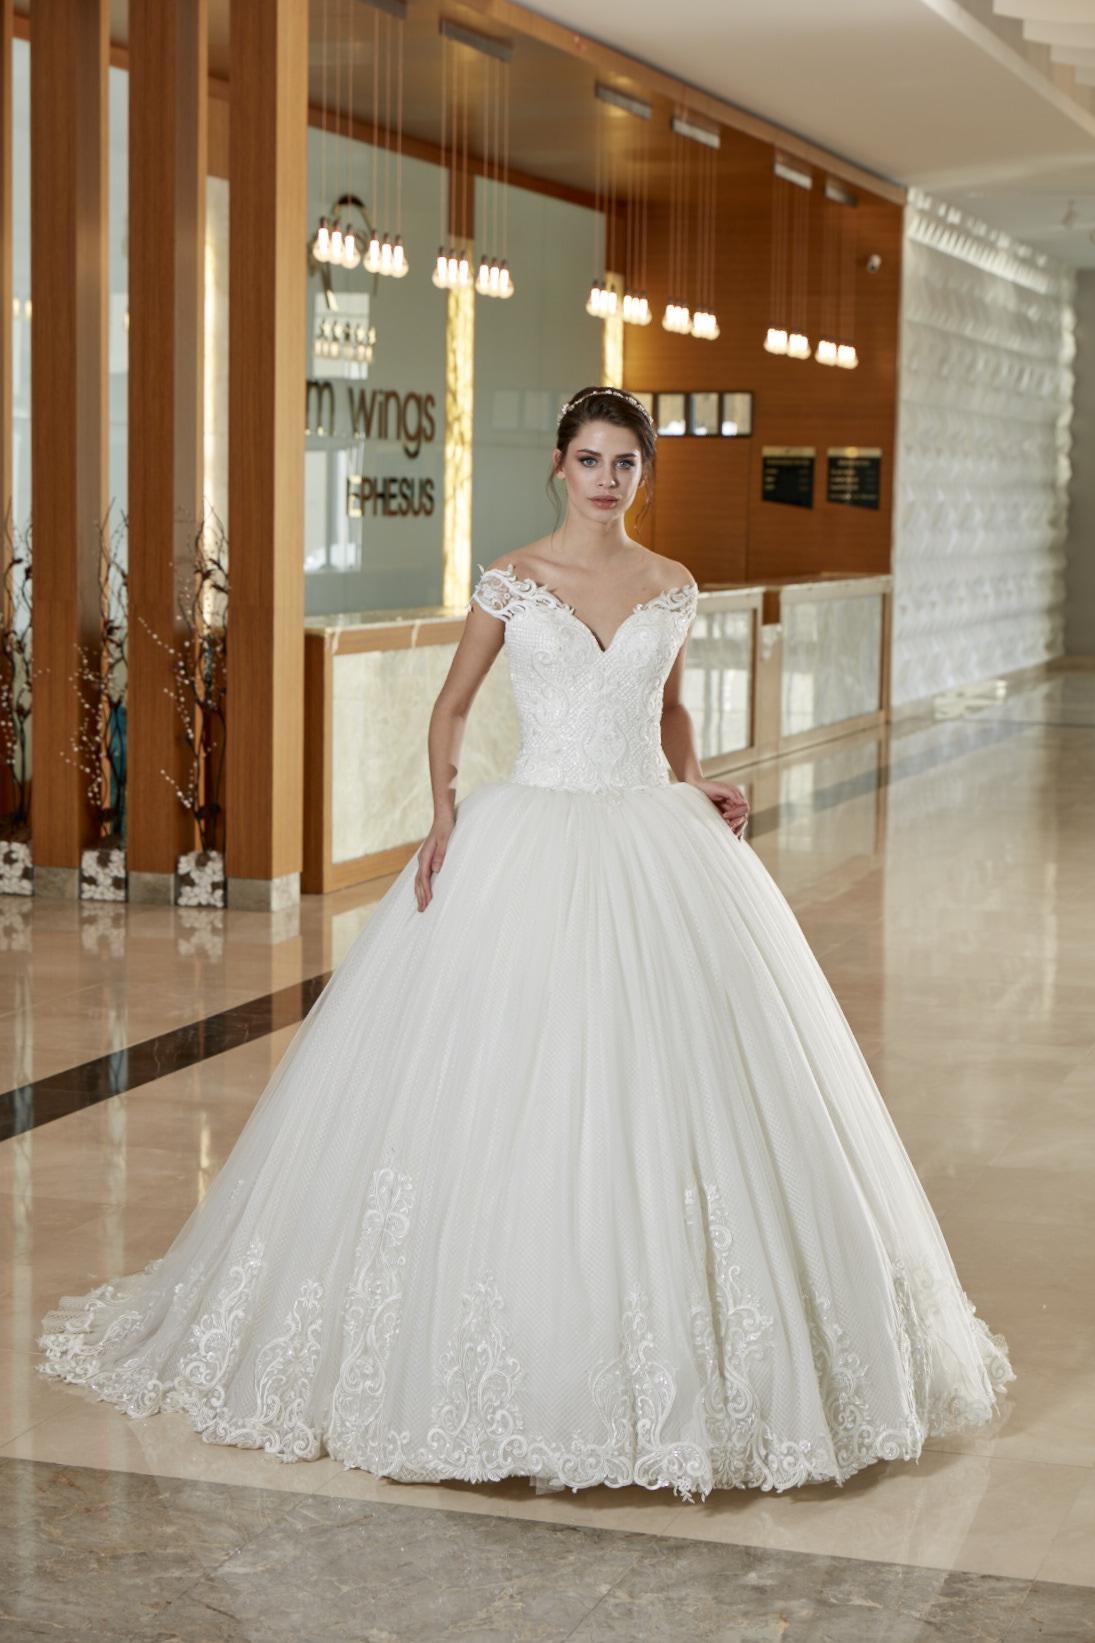 286fddeb342e5 Gelinlik | İzmir Gelinlik | Gelinlik İzmir | Maxvera | izmir wedding ...